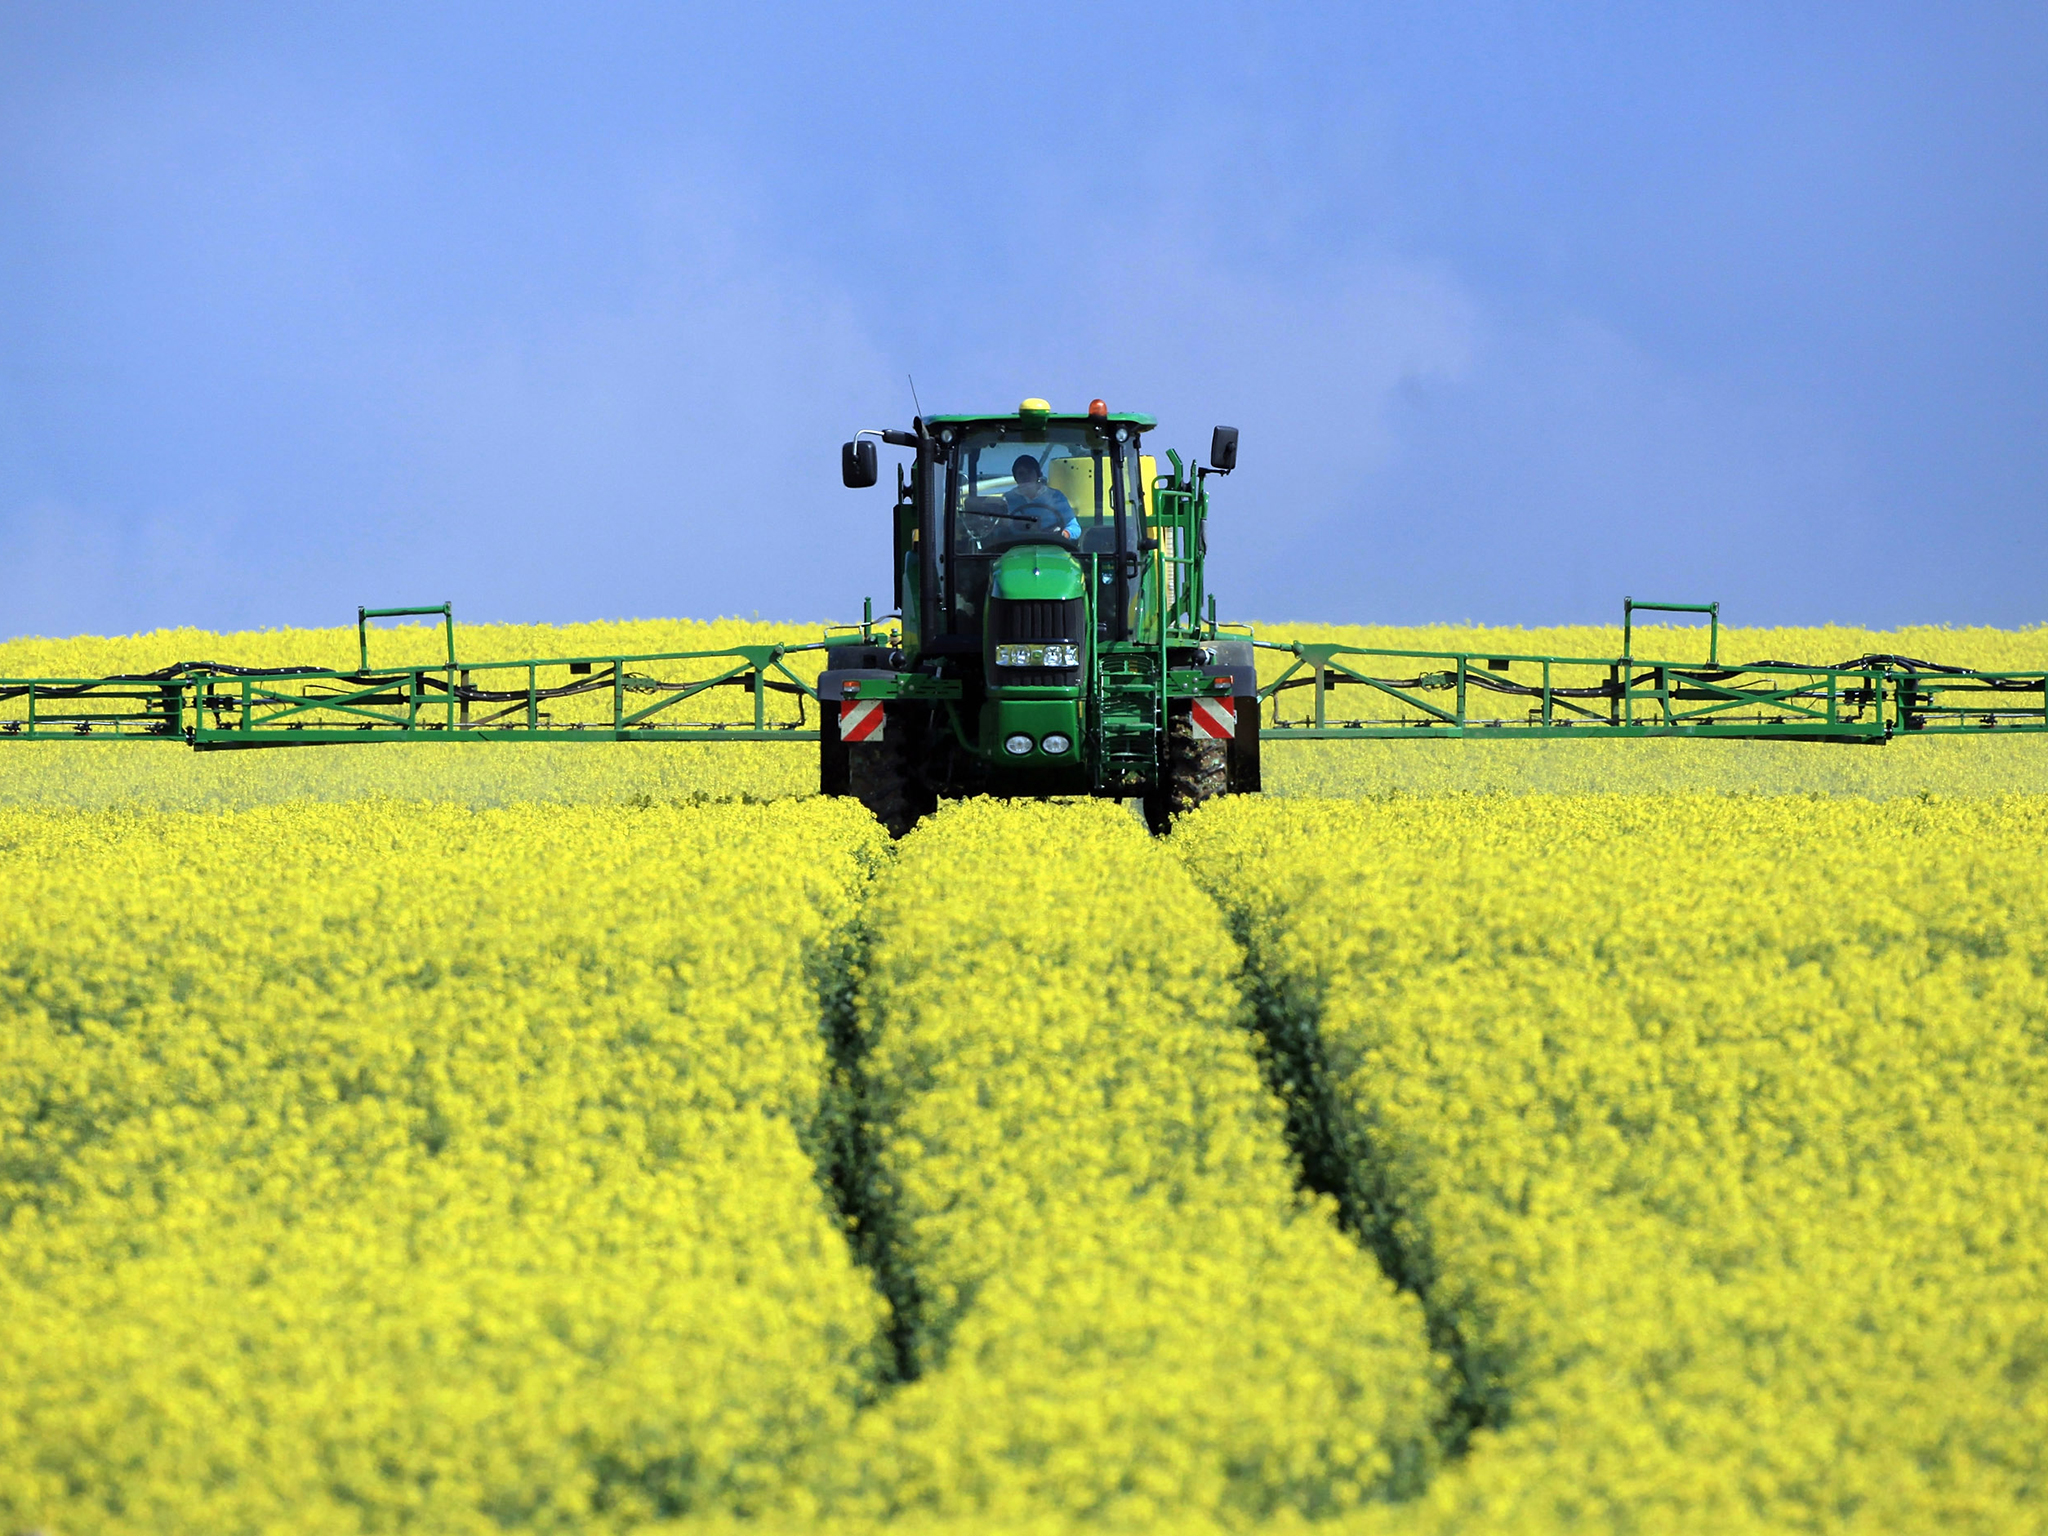 Oilseed rape concerns prompt industry meeting to resolve pressures